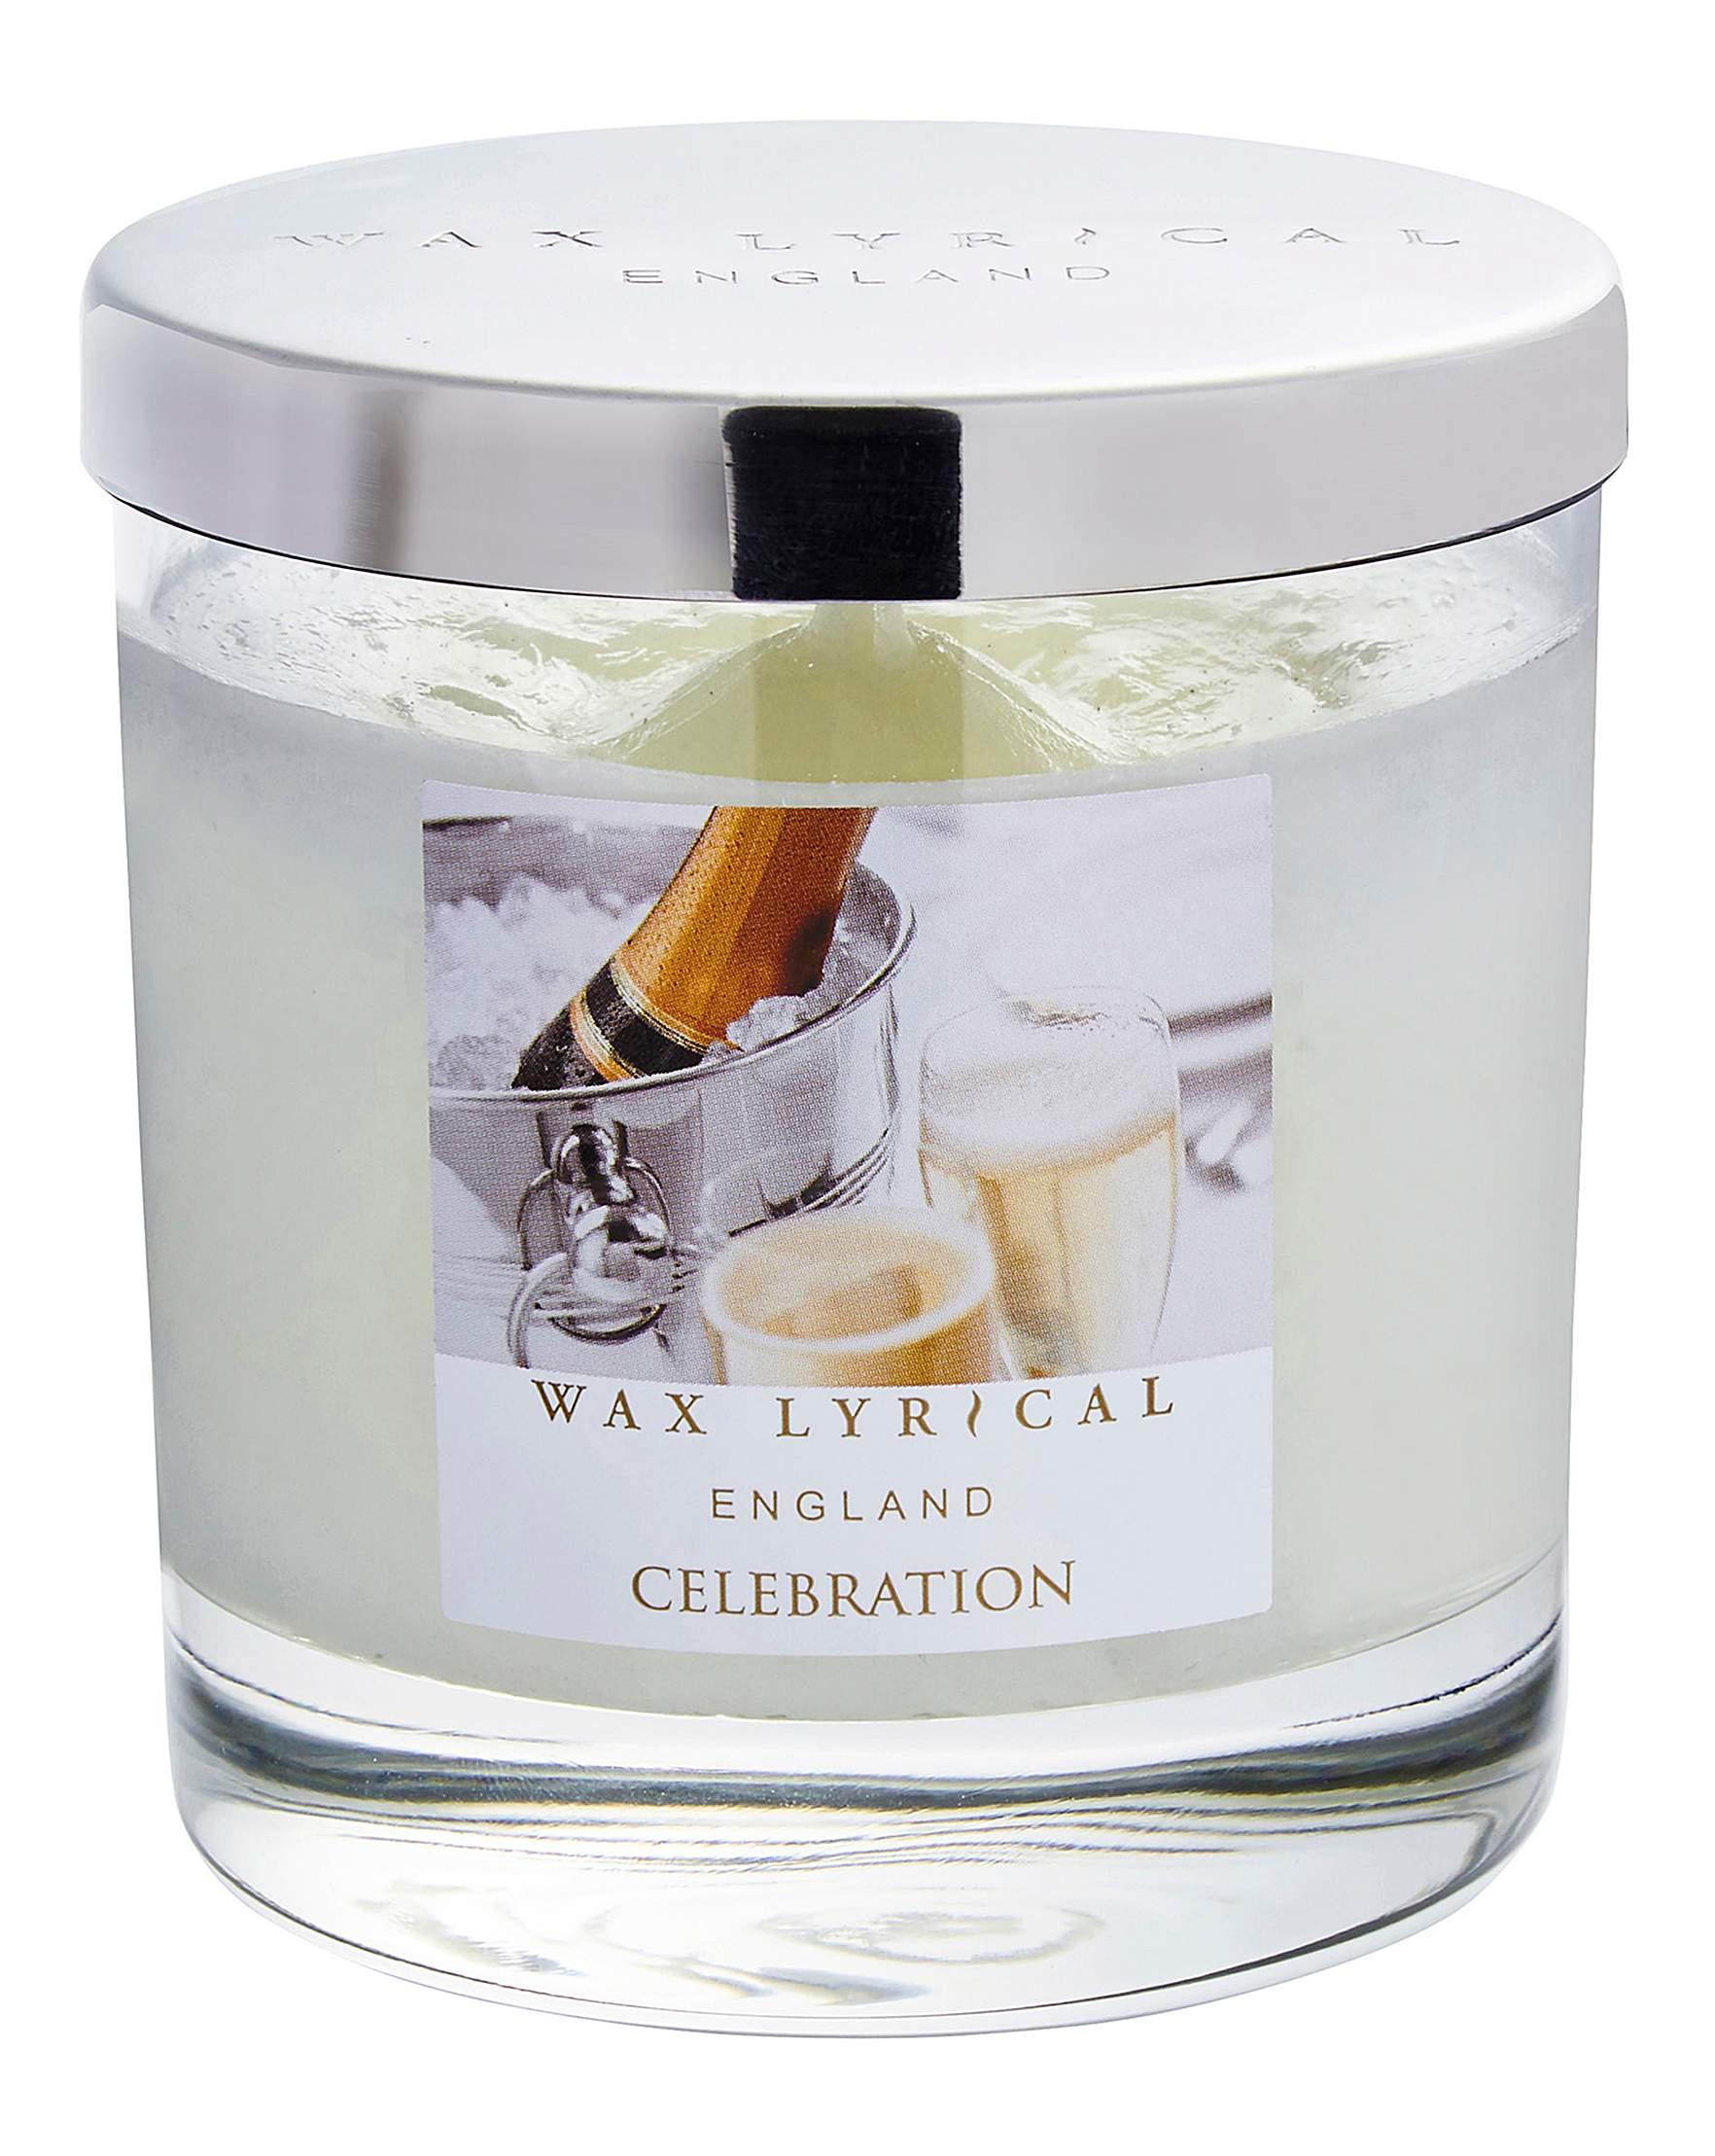 6a65f960a4 Personalised Wax Lyrical Celebration